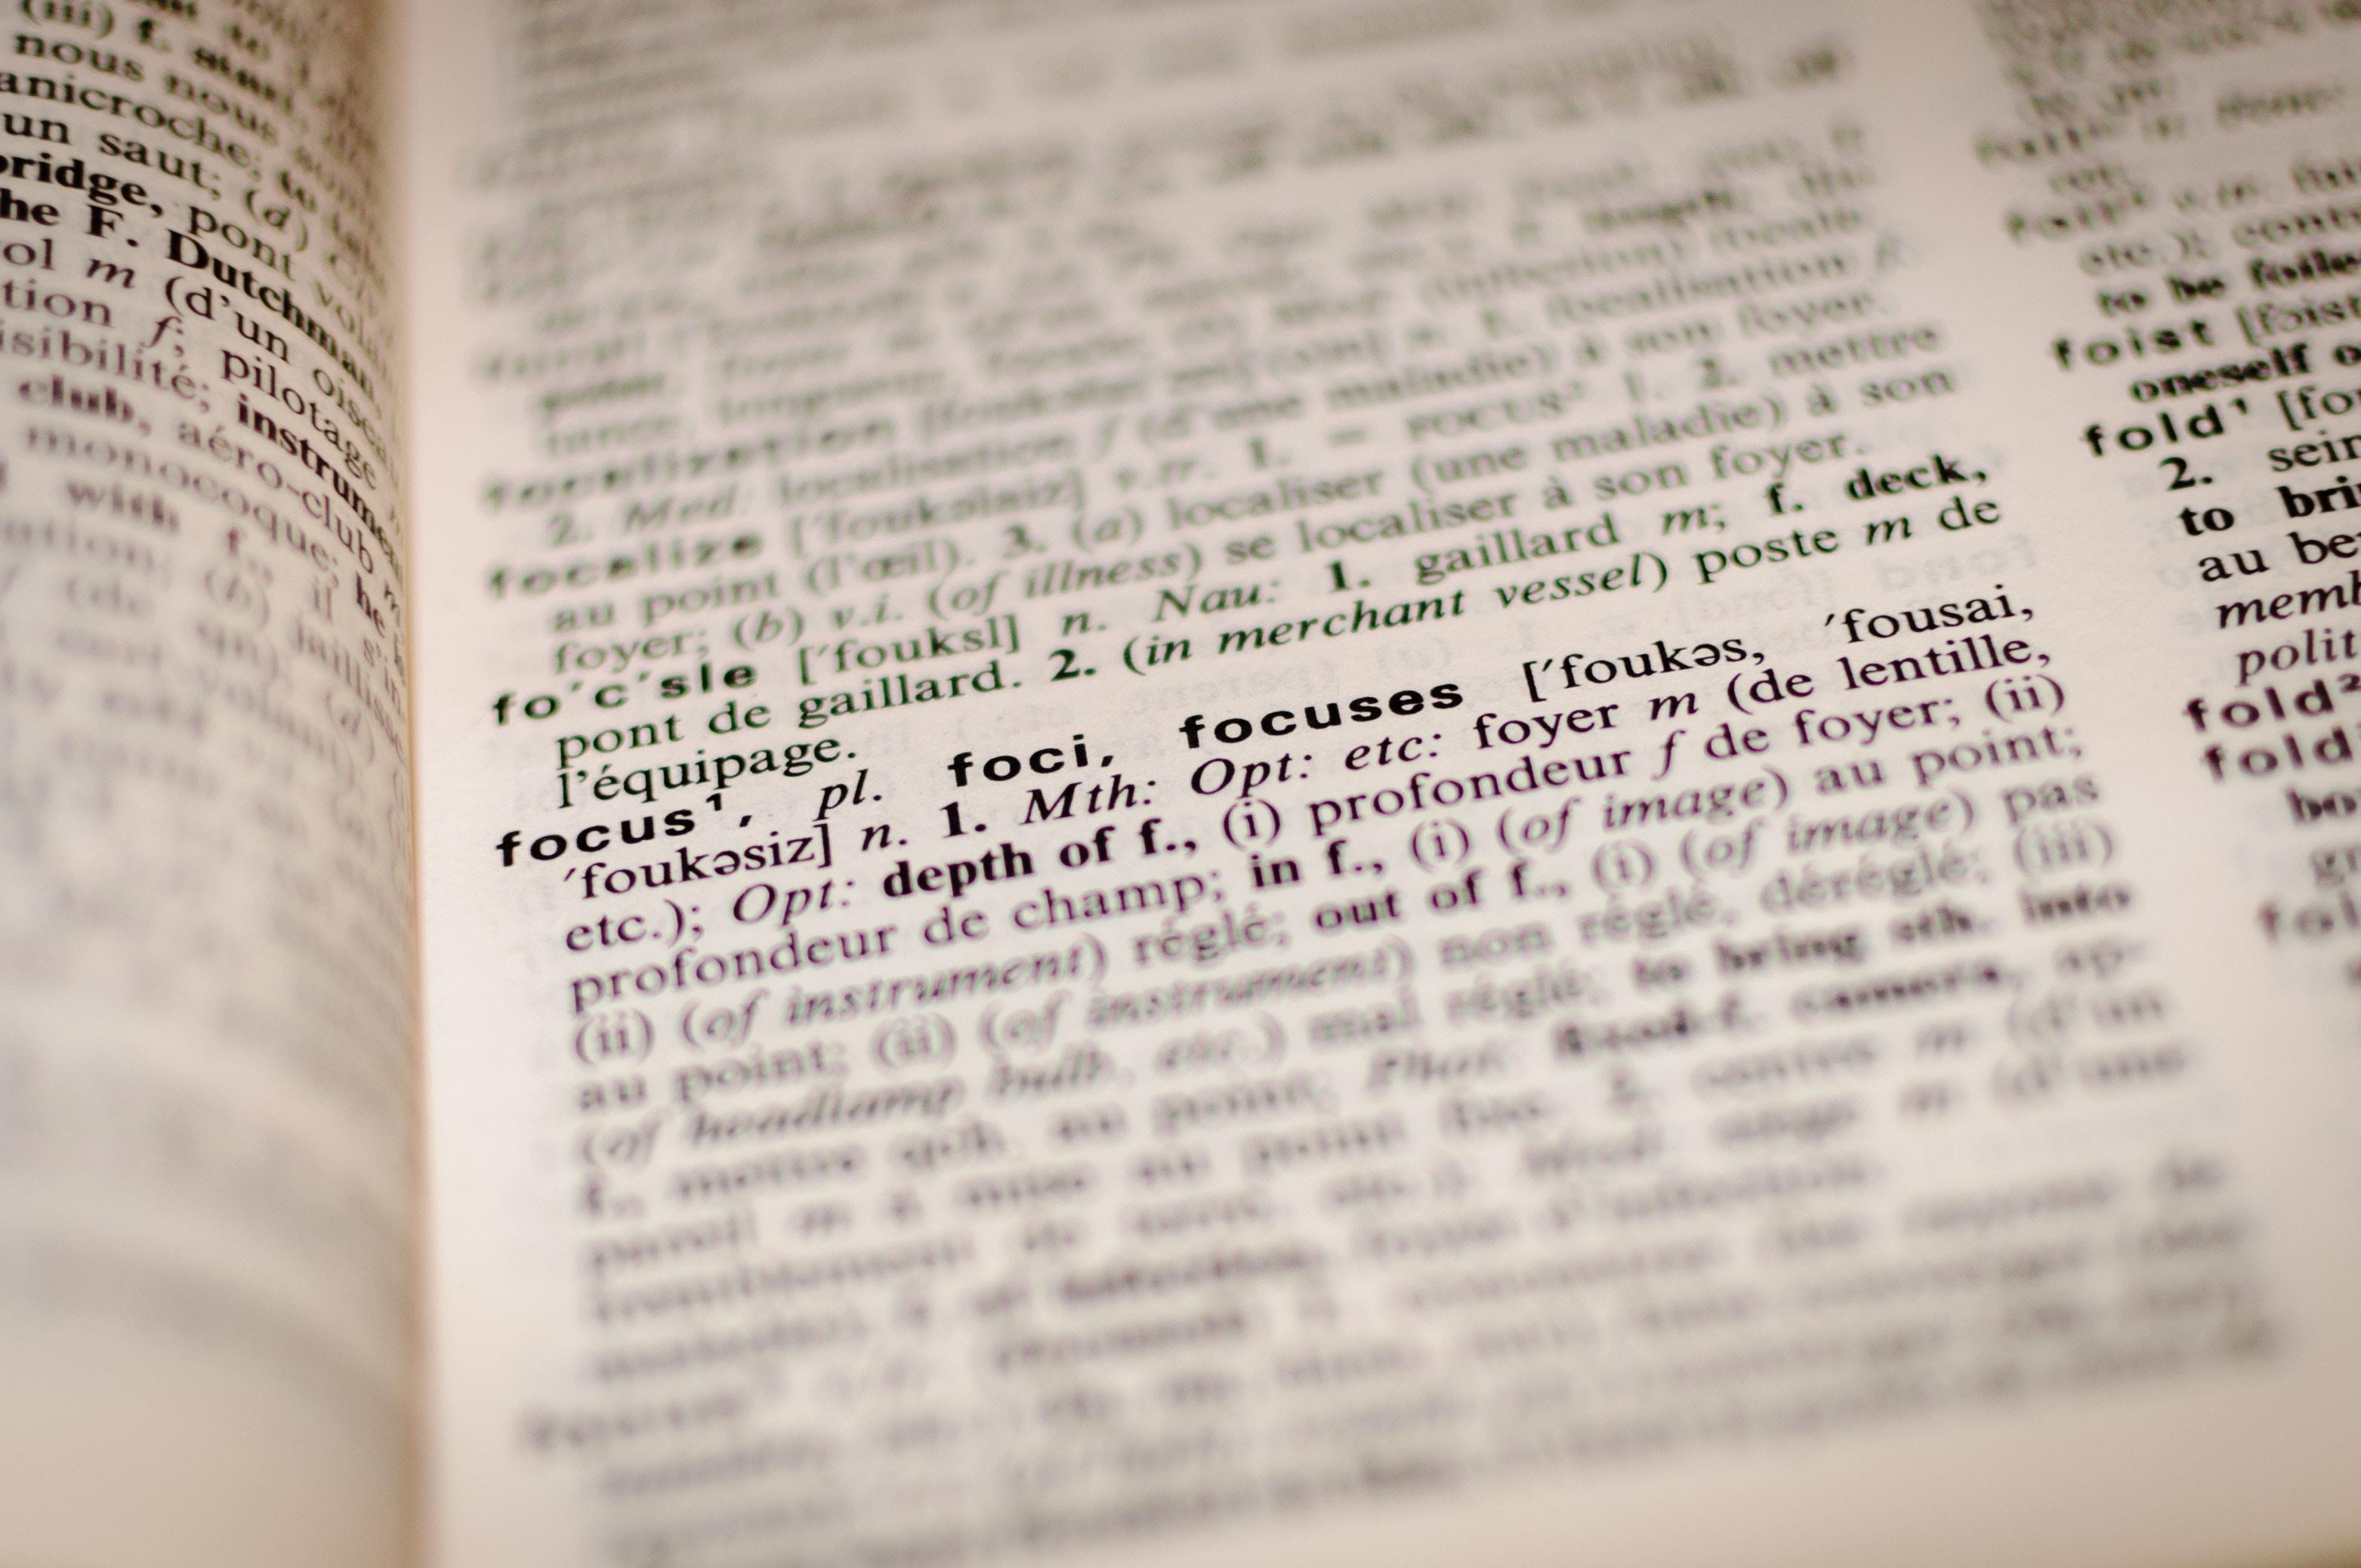 Despre munca (mea) de traducător (literar)